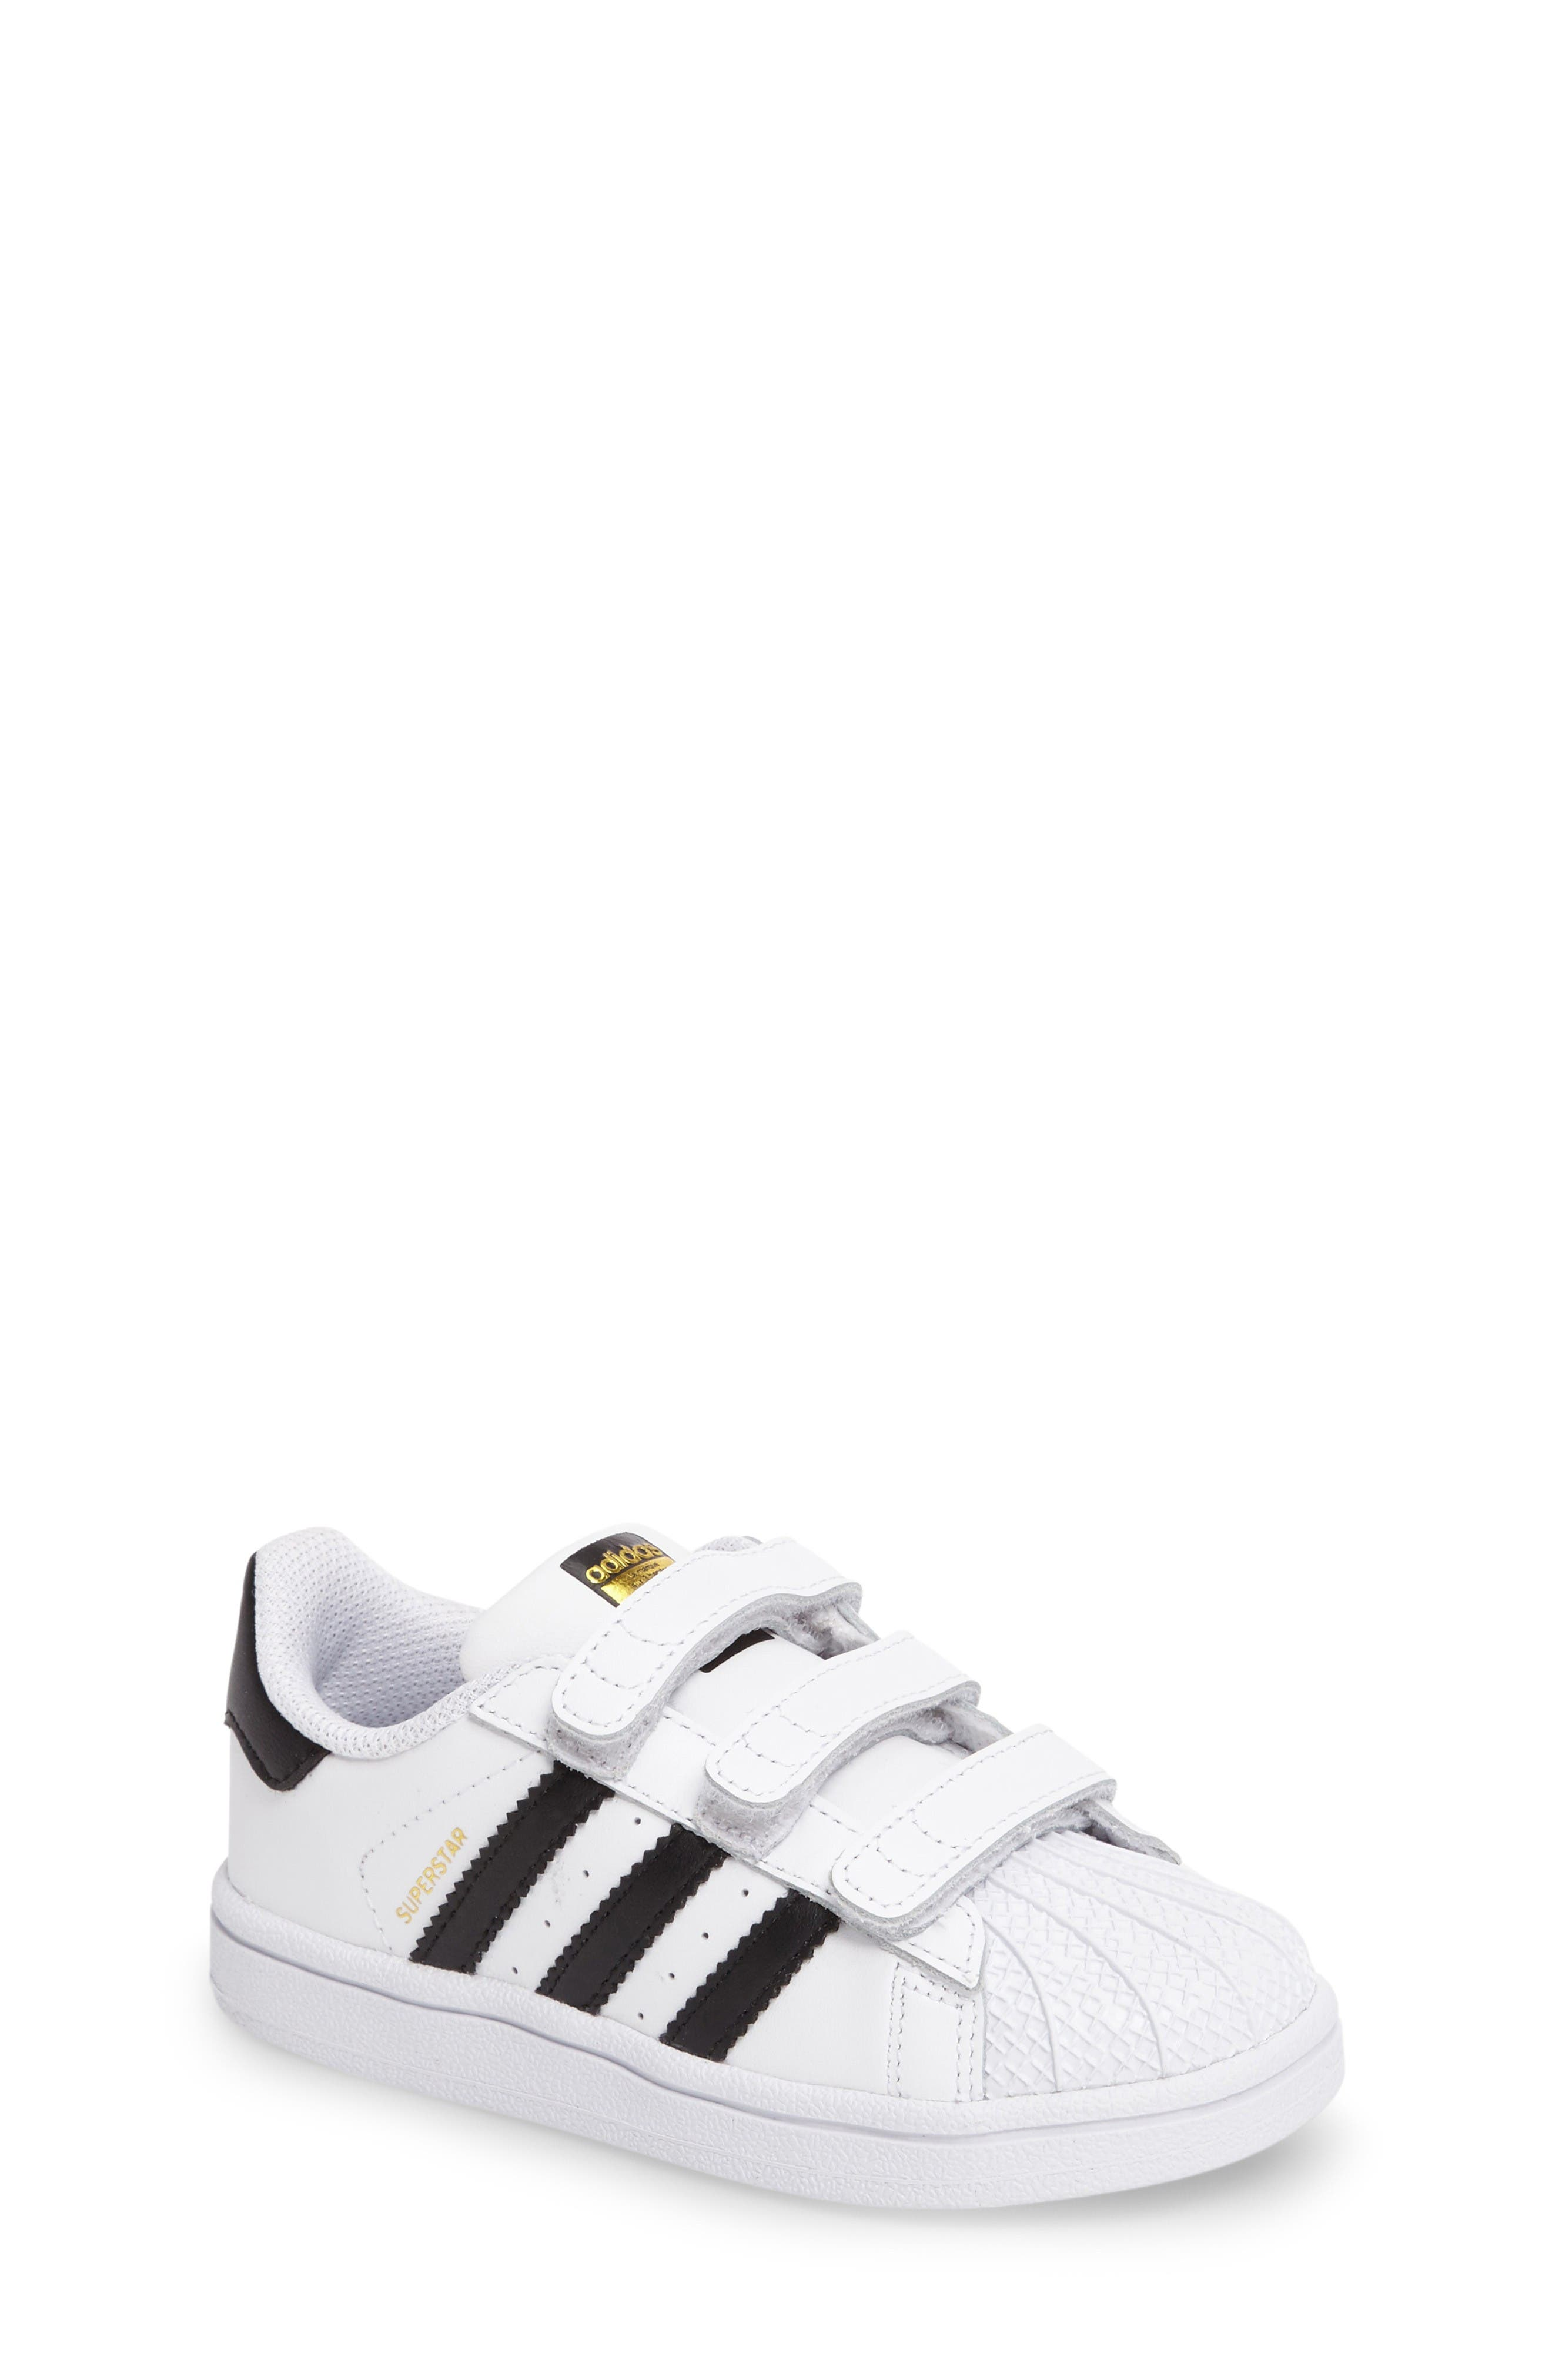 Superstar Foundation Sneaker,                         Main,                         color, White/ Core Black/ White